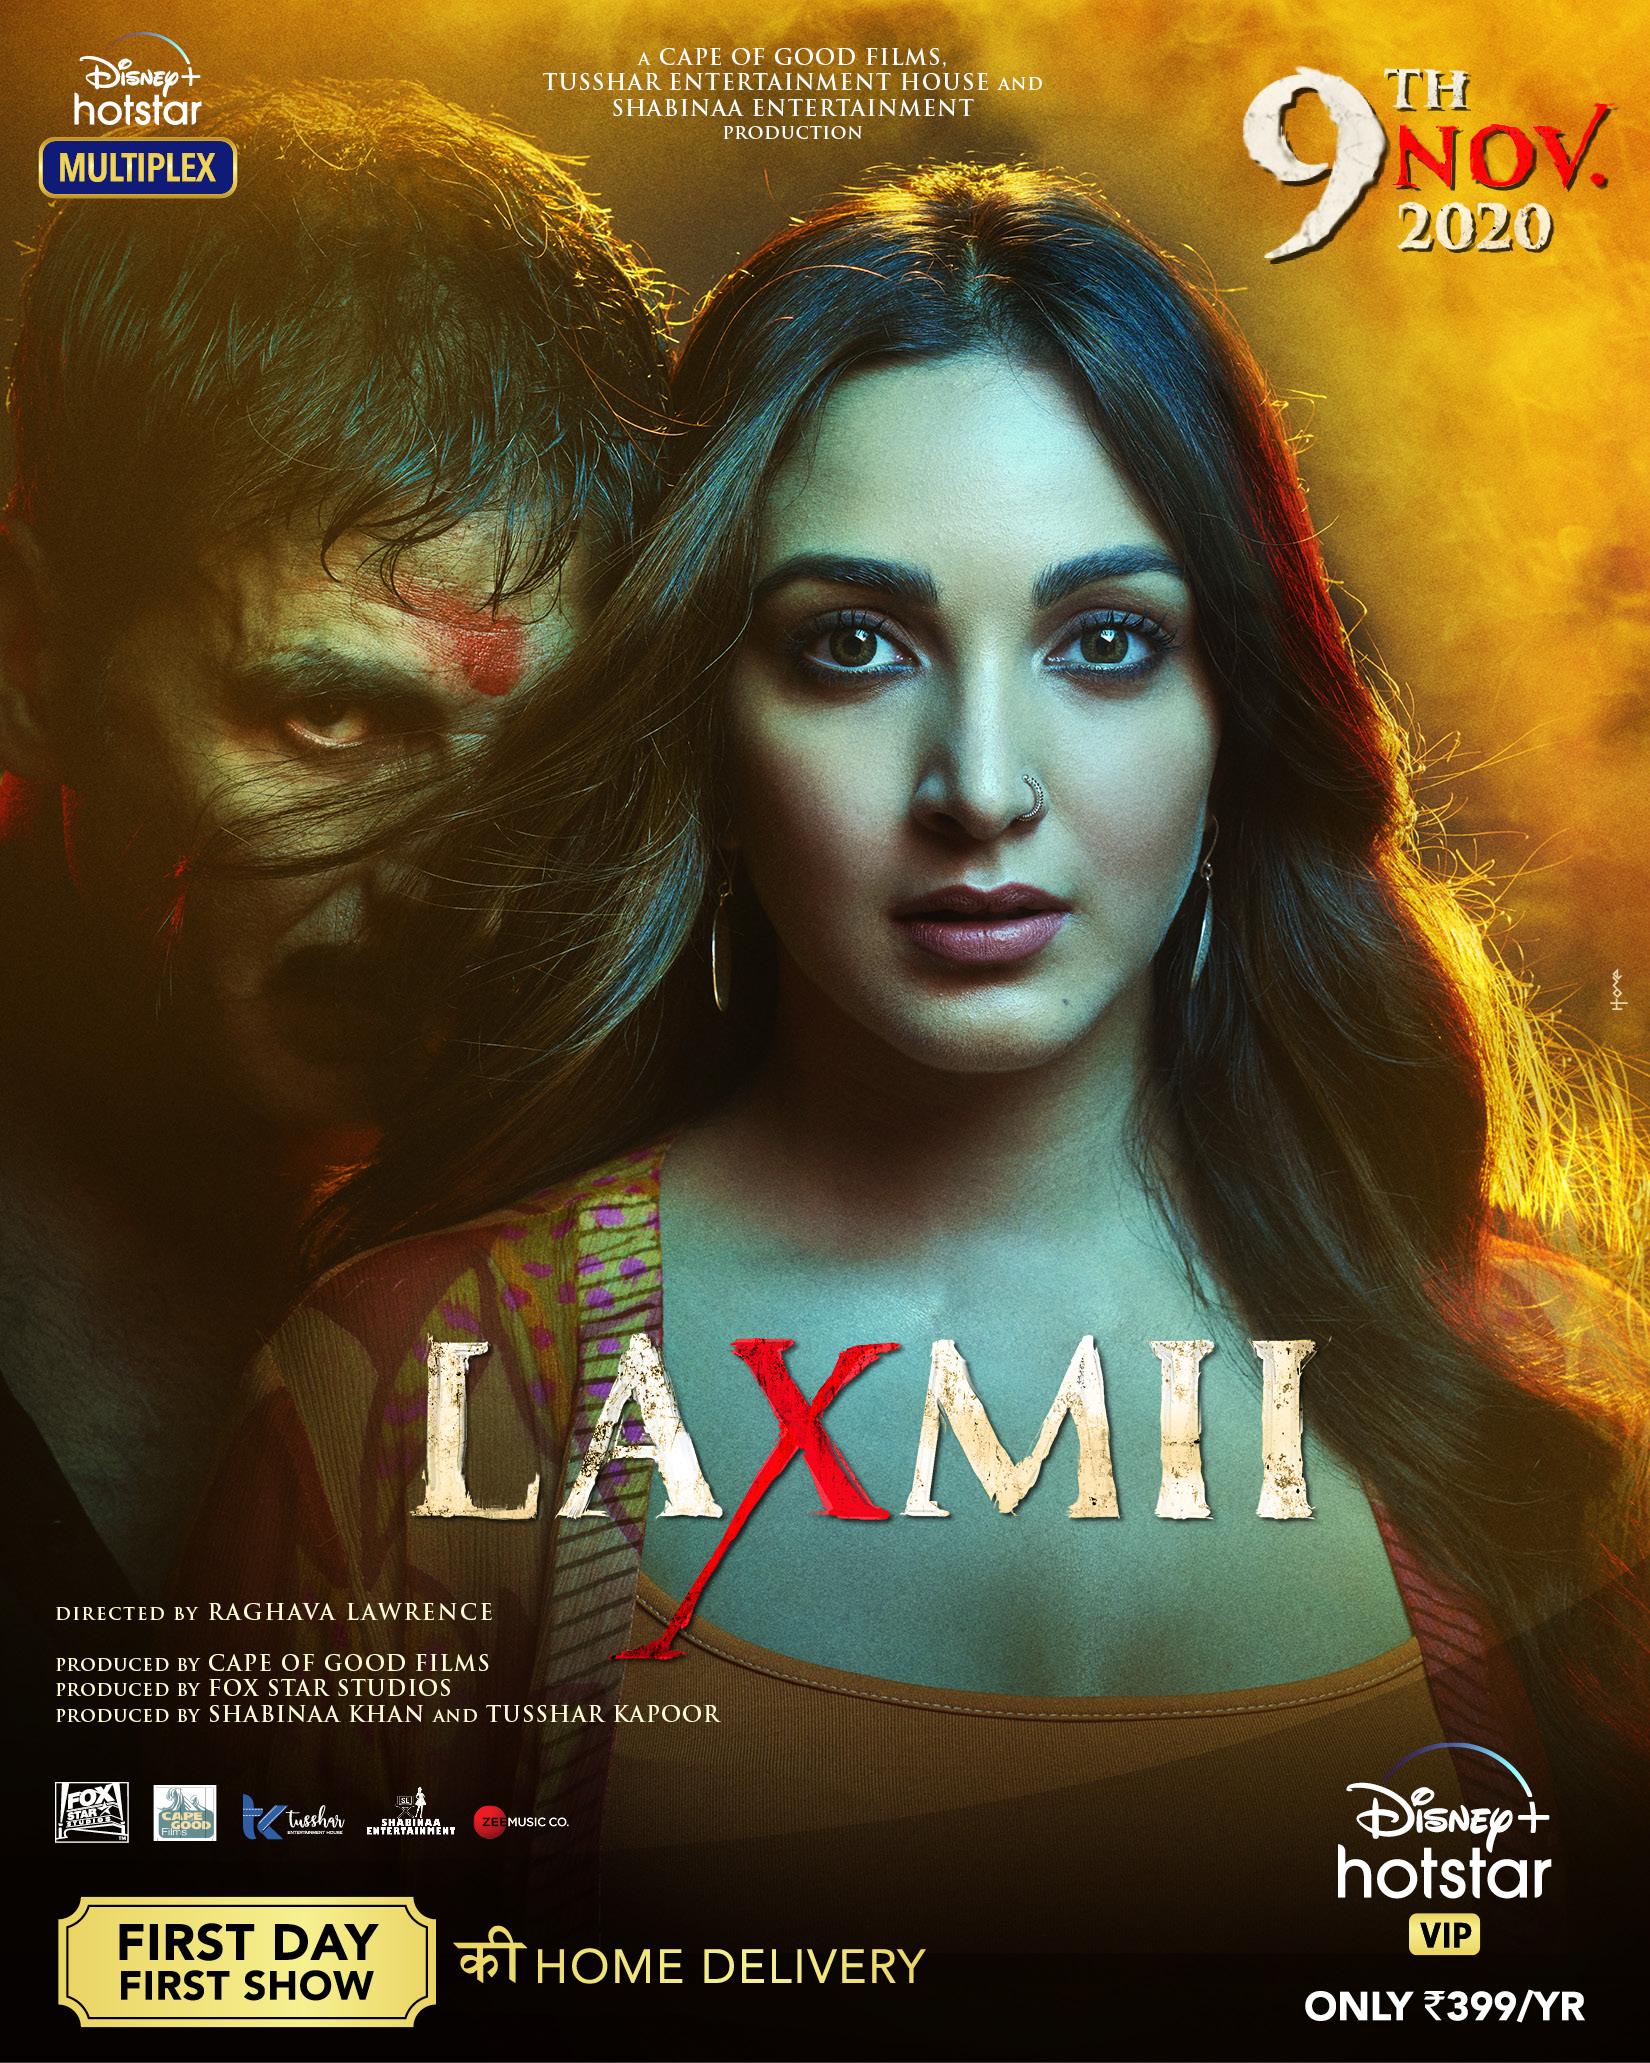 Laxmii': Bollywood blockbuster offers problematic transgender portrayal, critics say - CNN Style